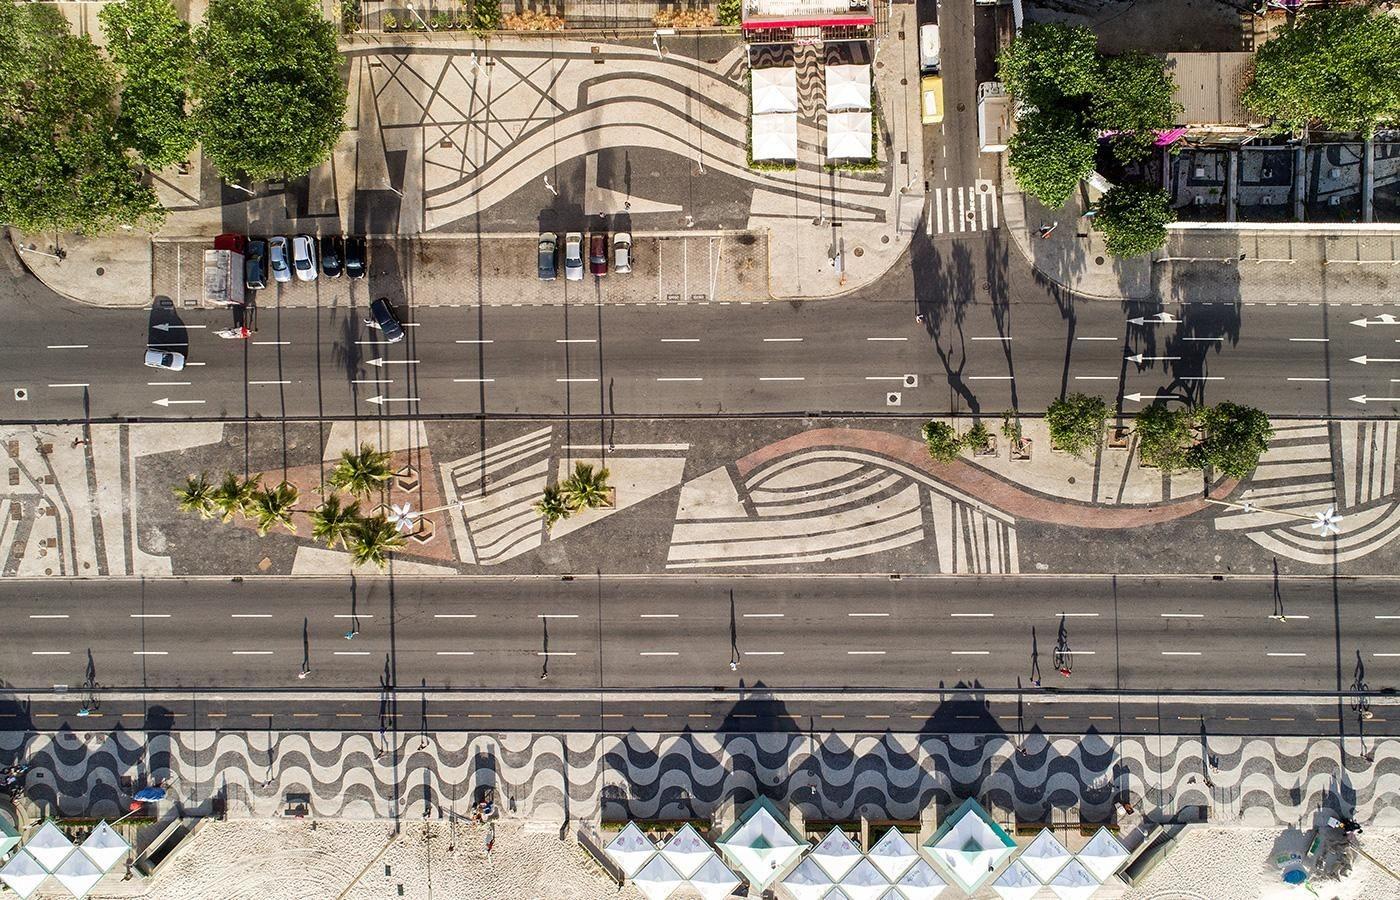 Copacabana promenade, Rio de Janeiro - Sheet3